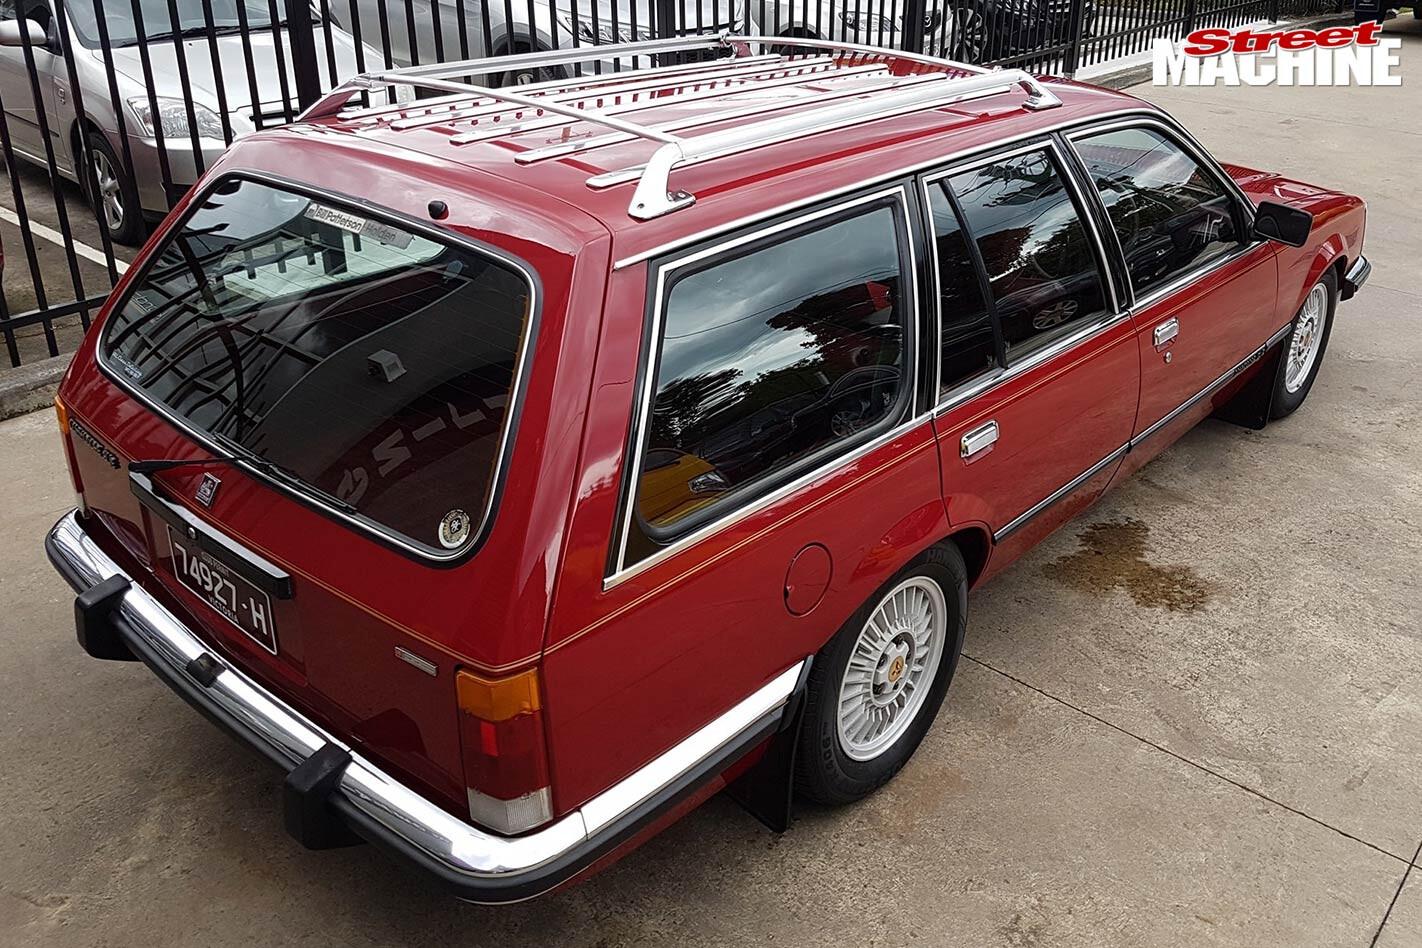 Holden Commodore VC wagon